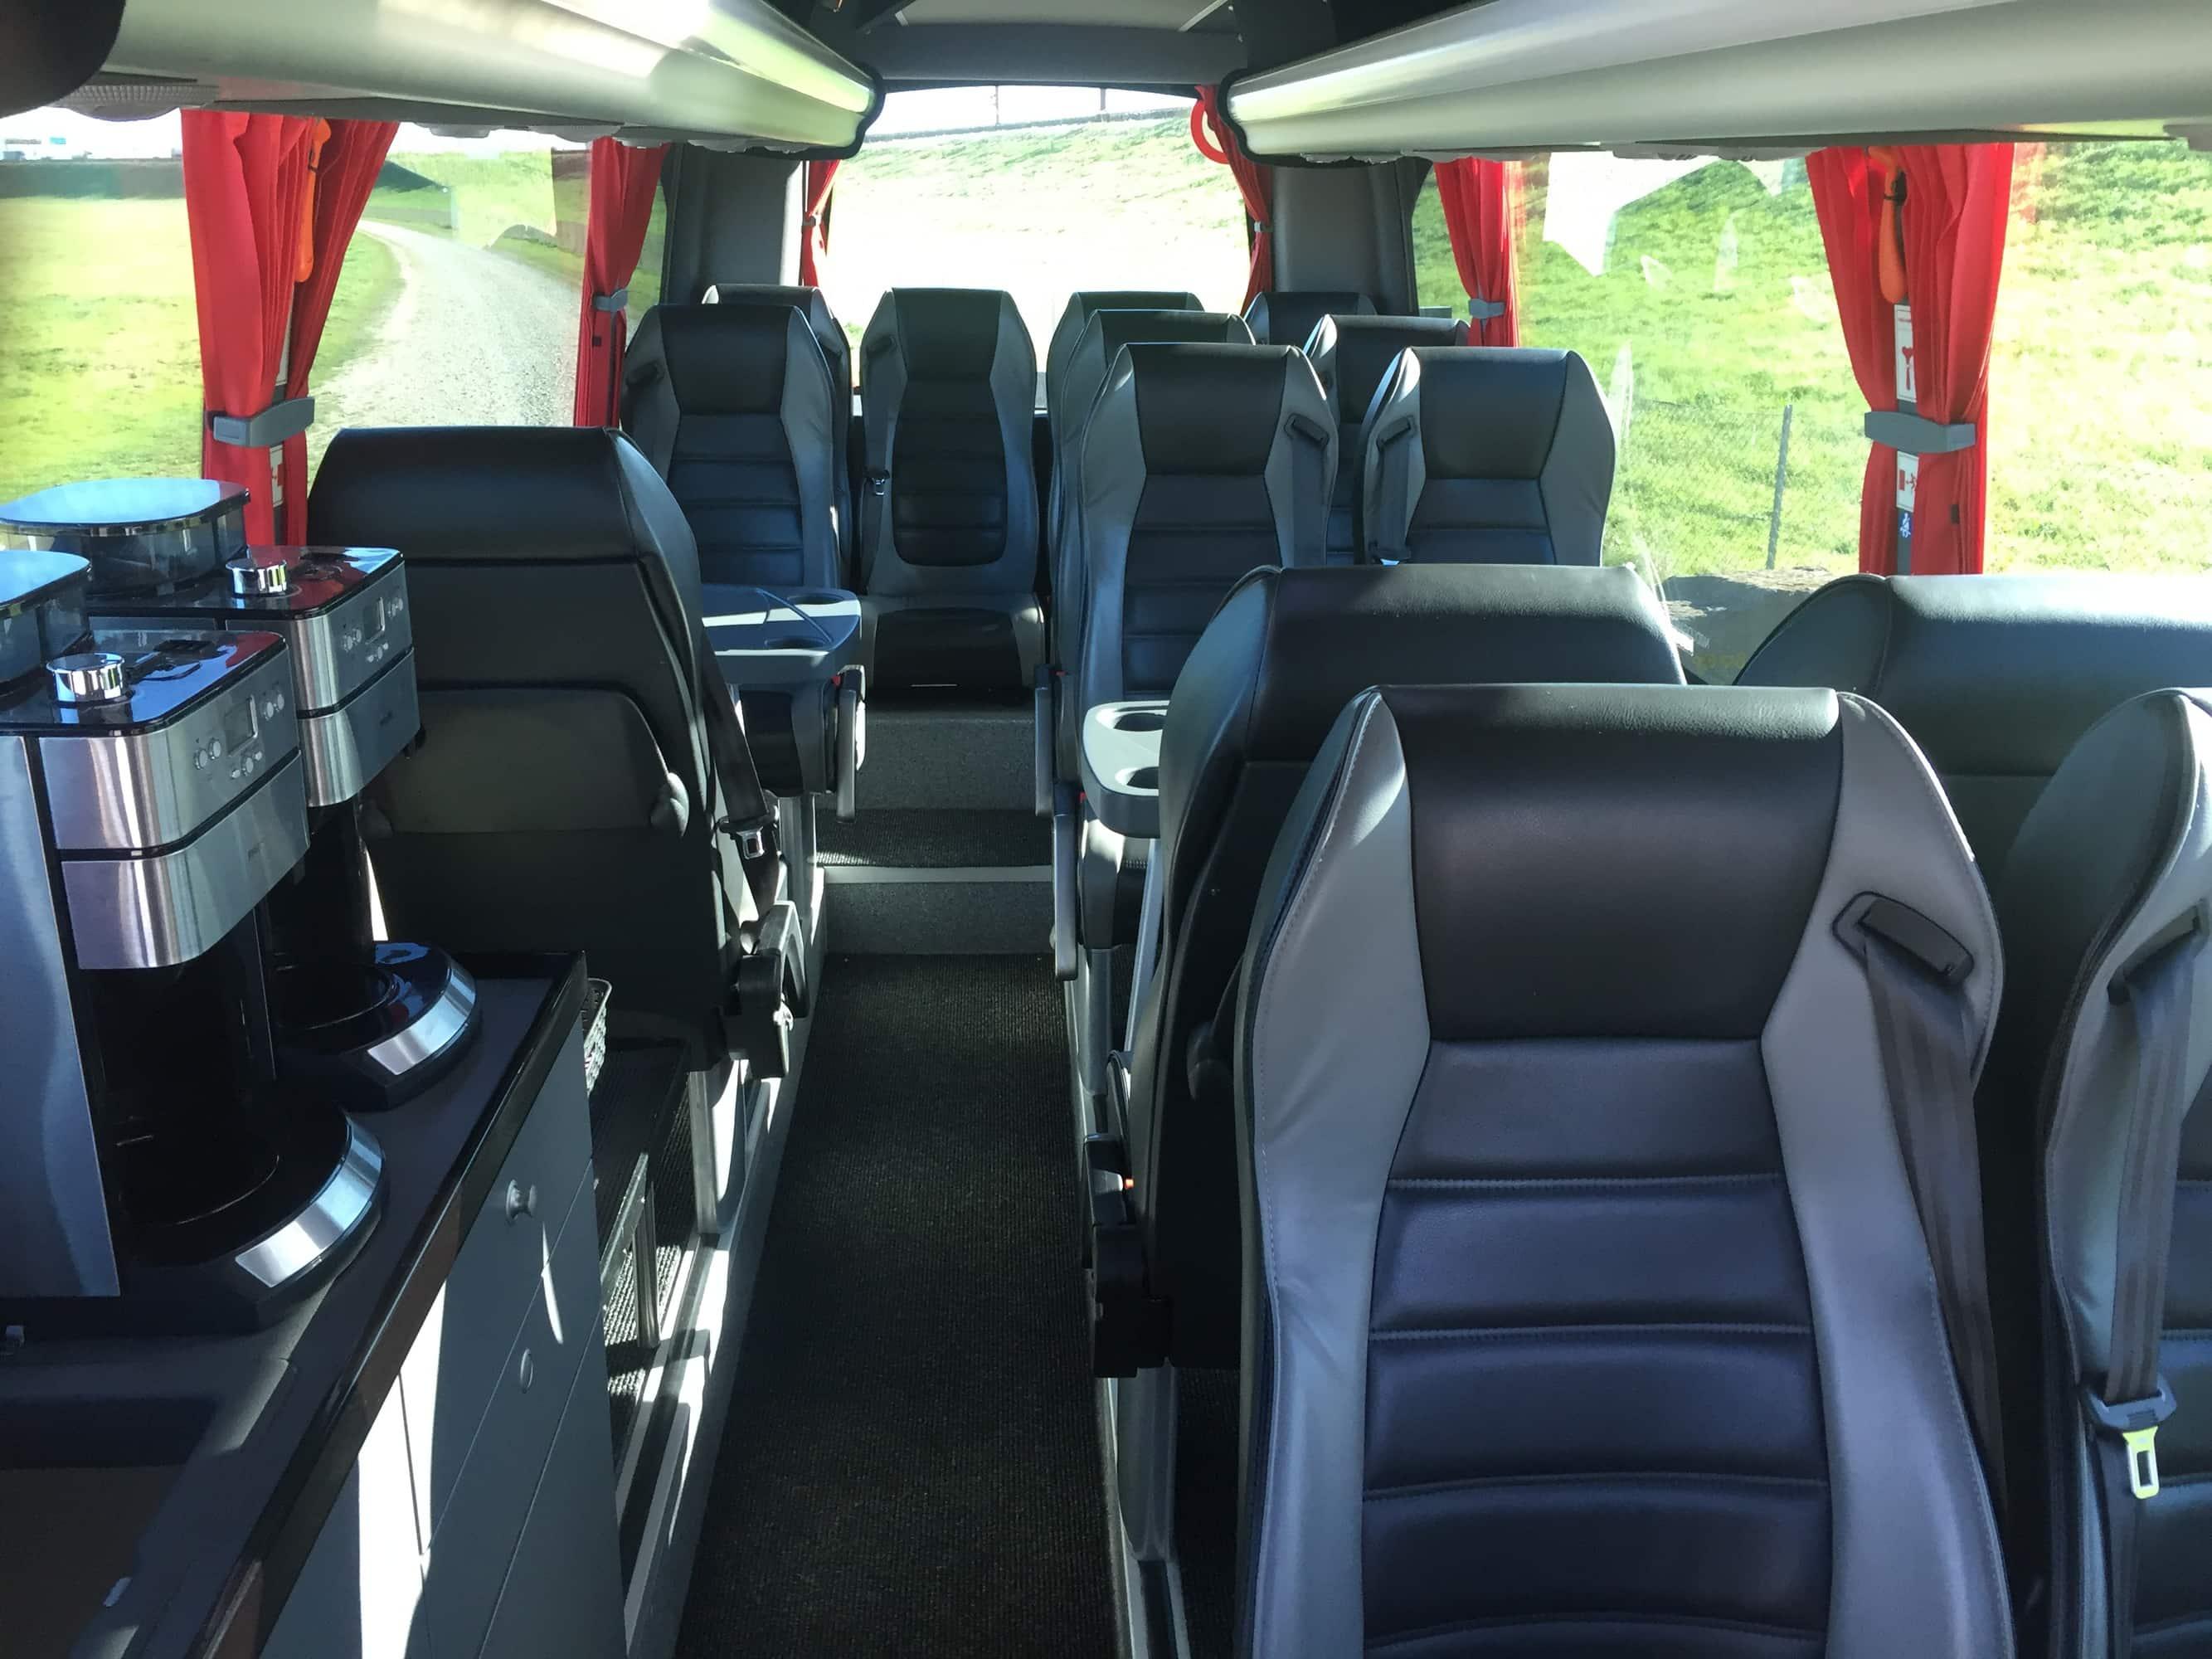 Nyborg rejser VIP bus